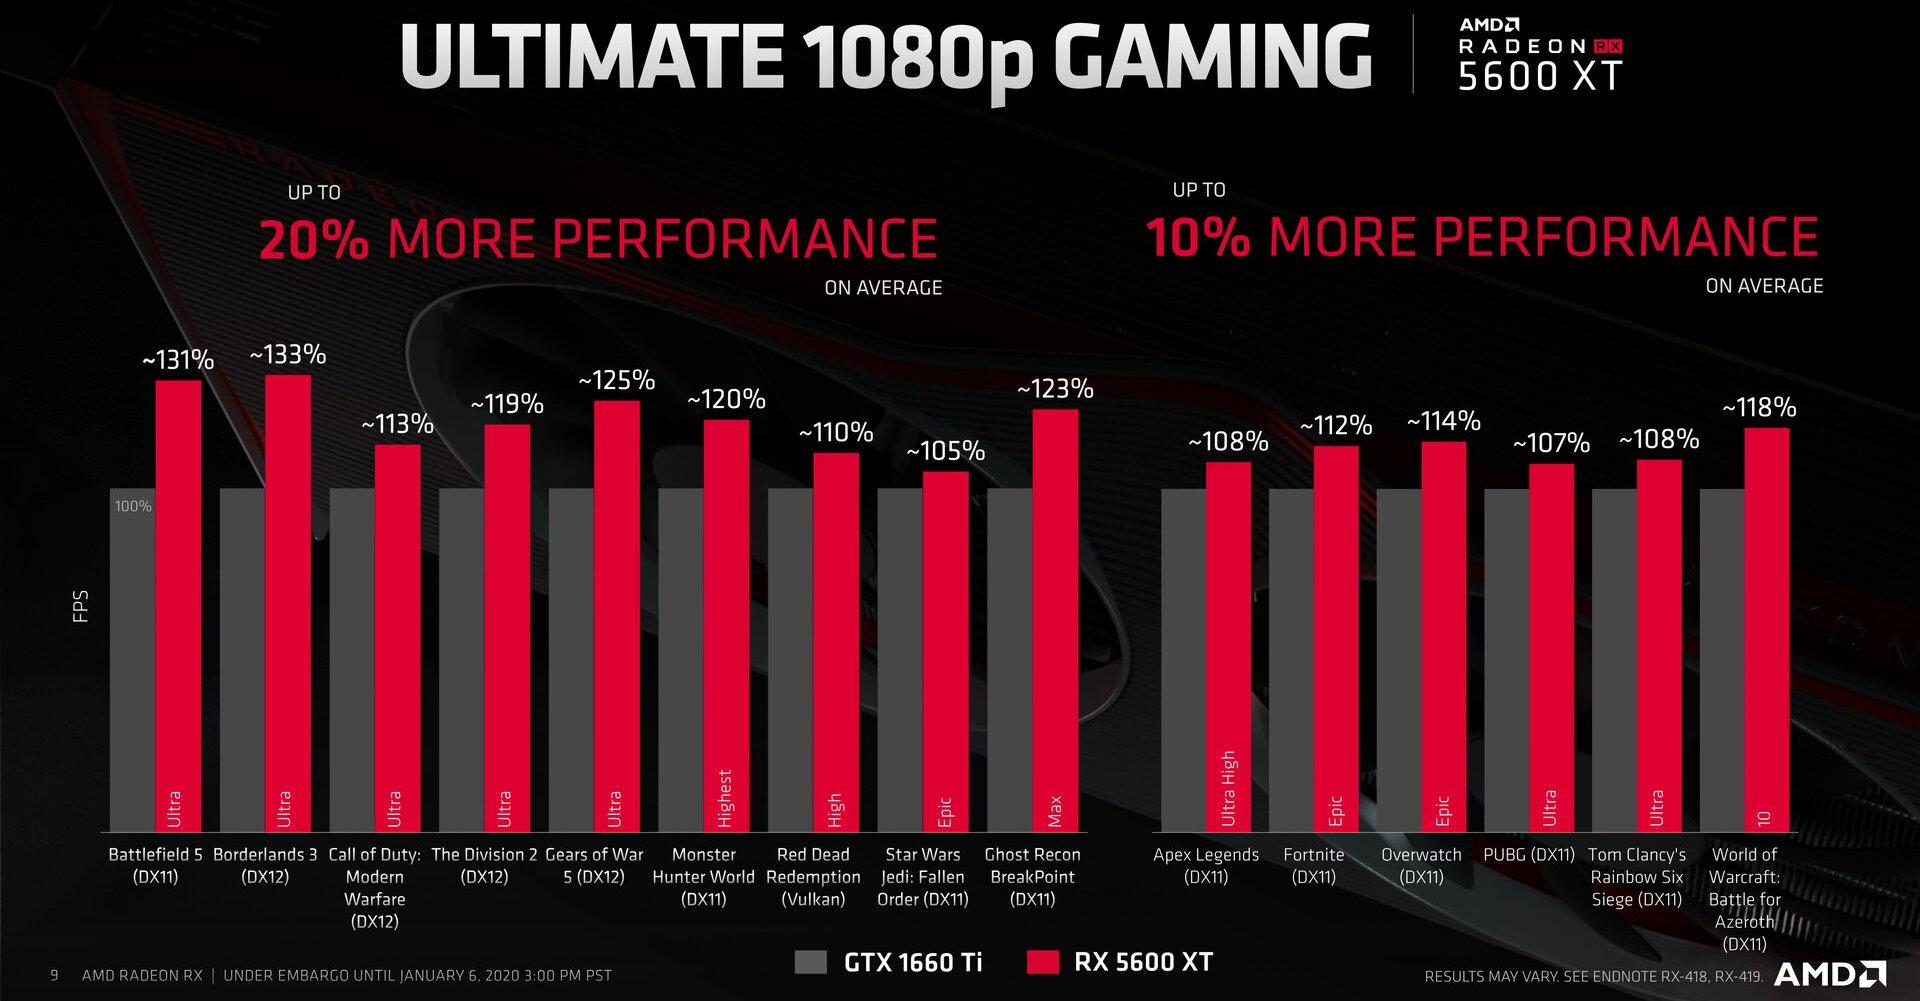 https://cdn.videocardz.com/1/2020/01/AMD-Radeon-RX-5600-XT-3.jpg